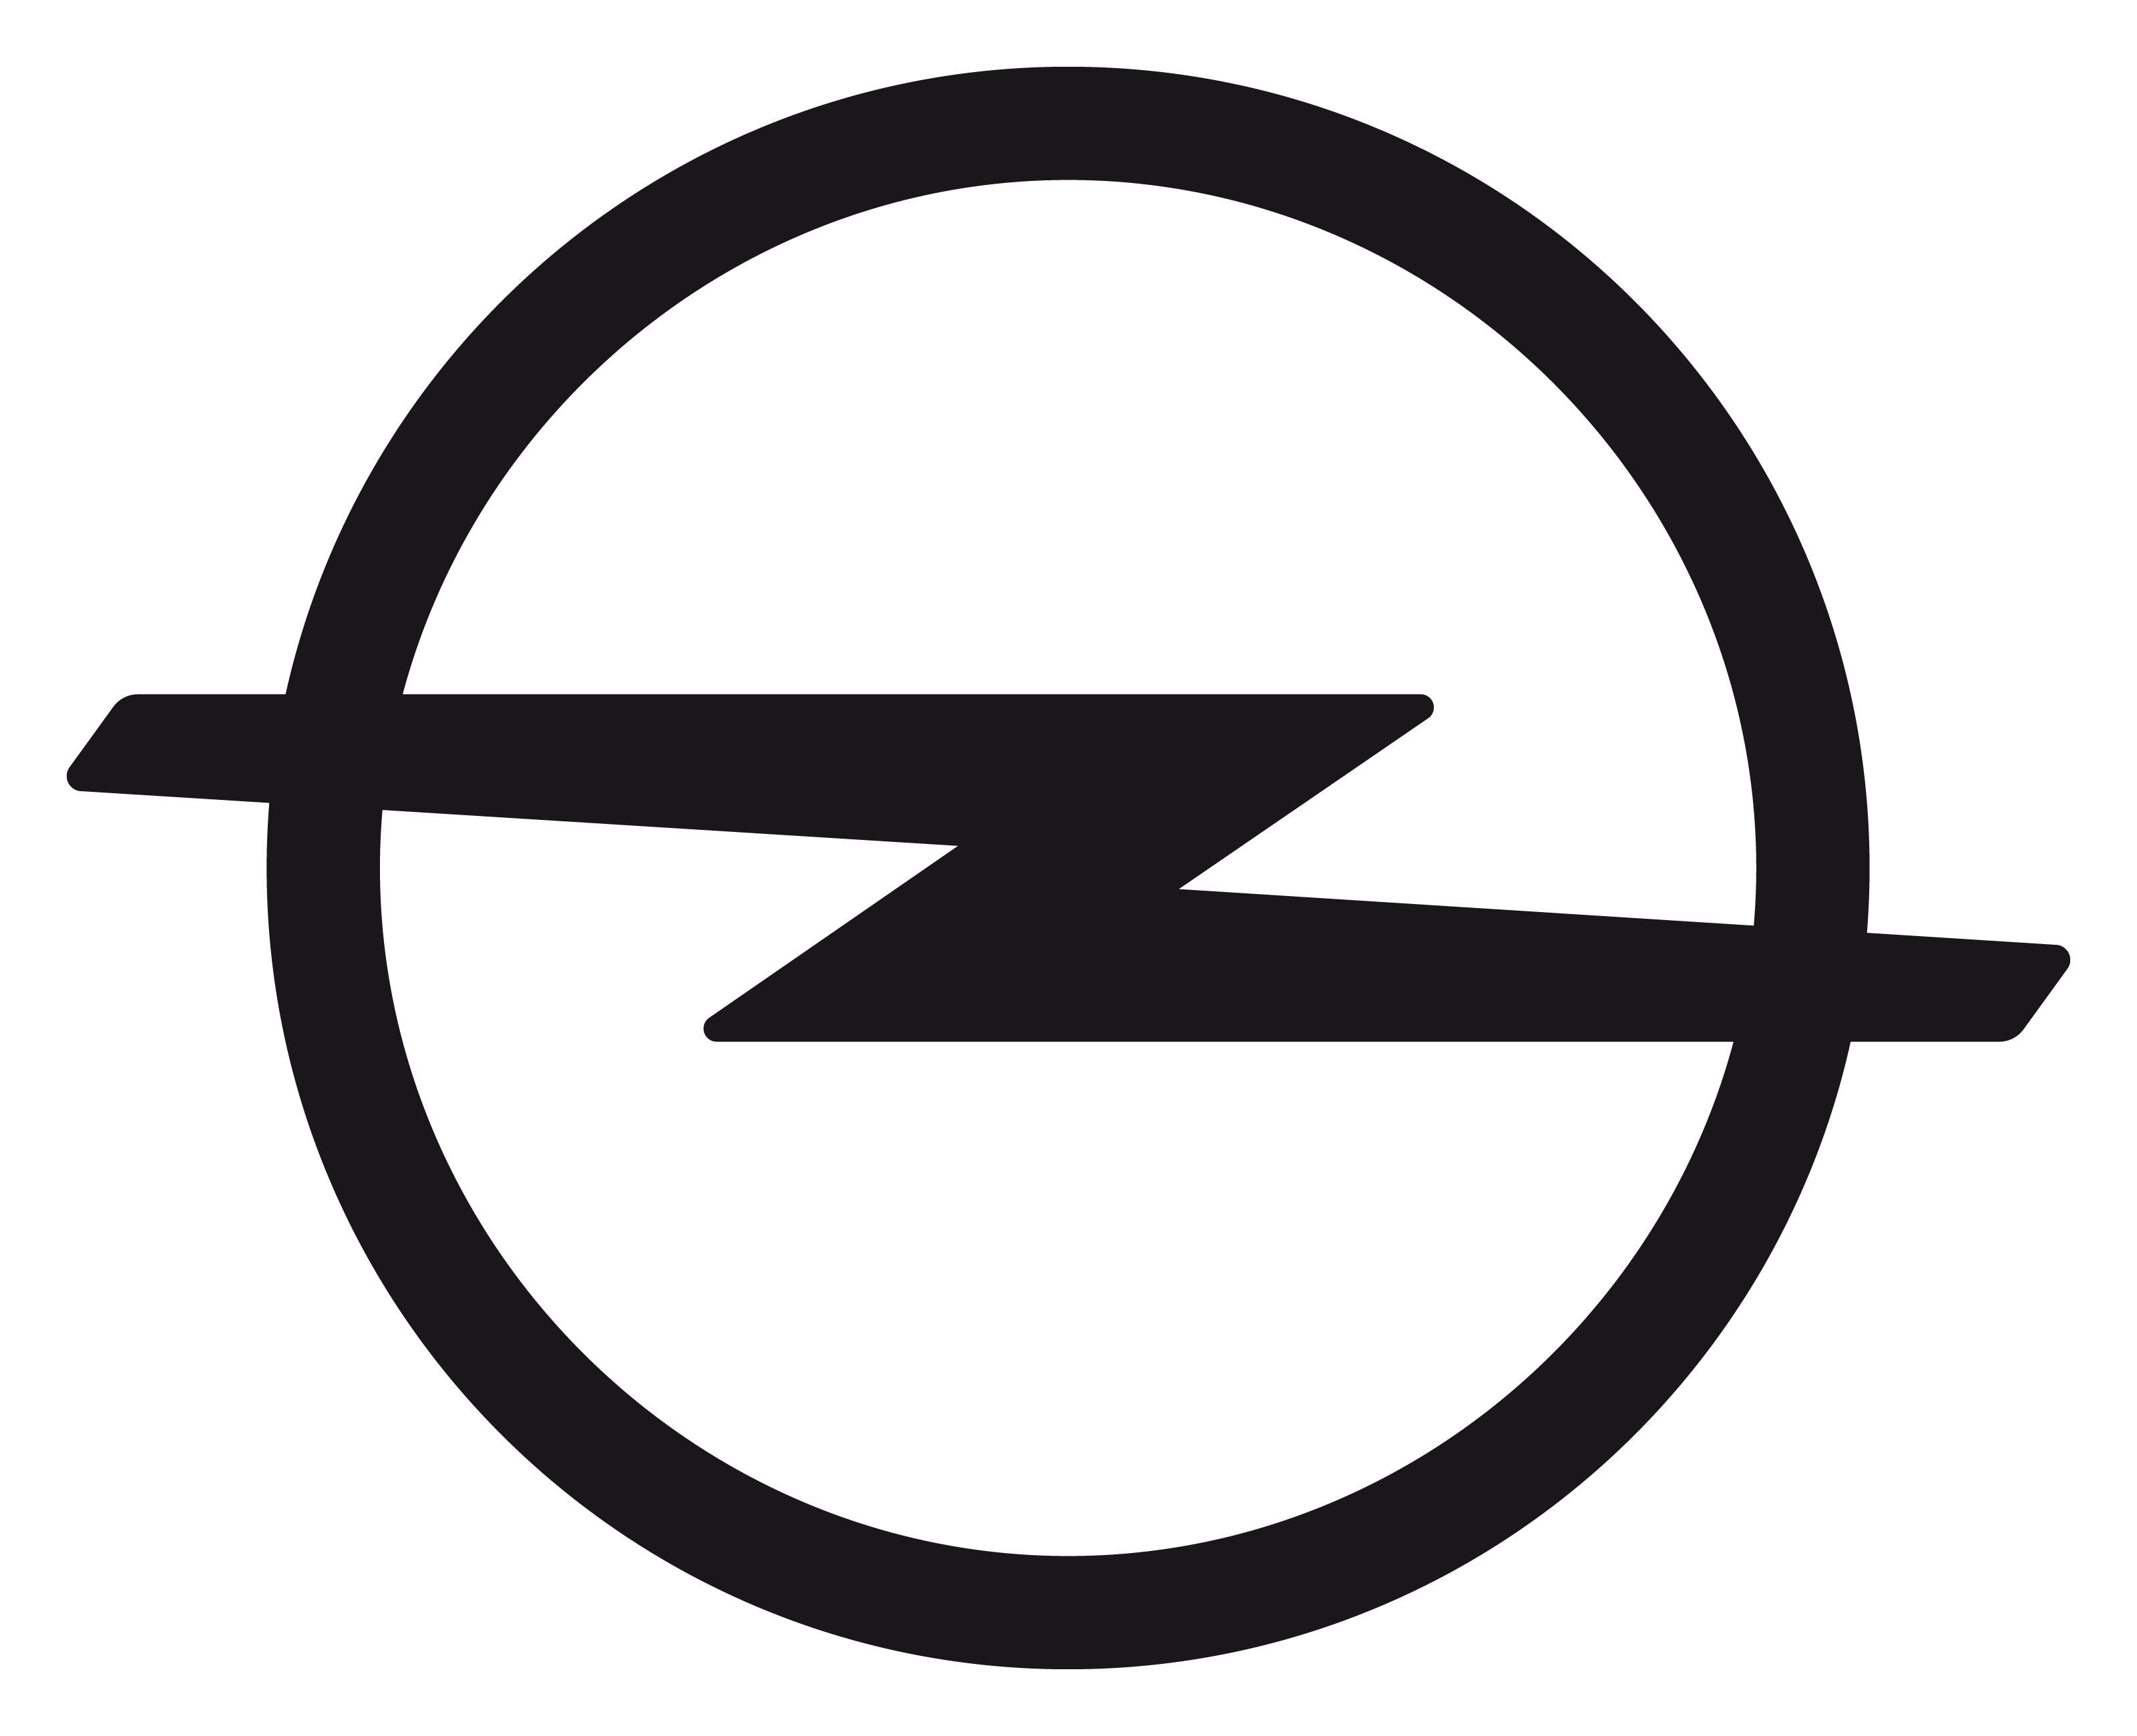 nissan logo transparent background. opel nissan logo transparent background y